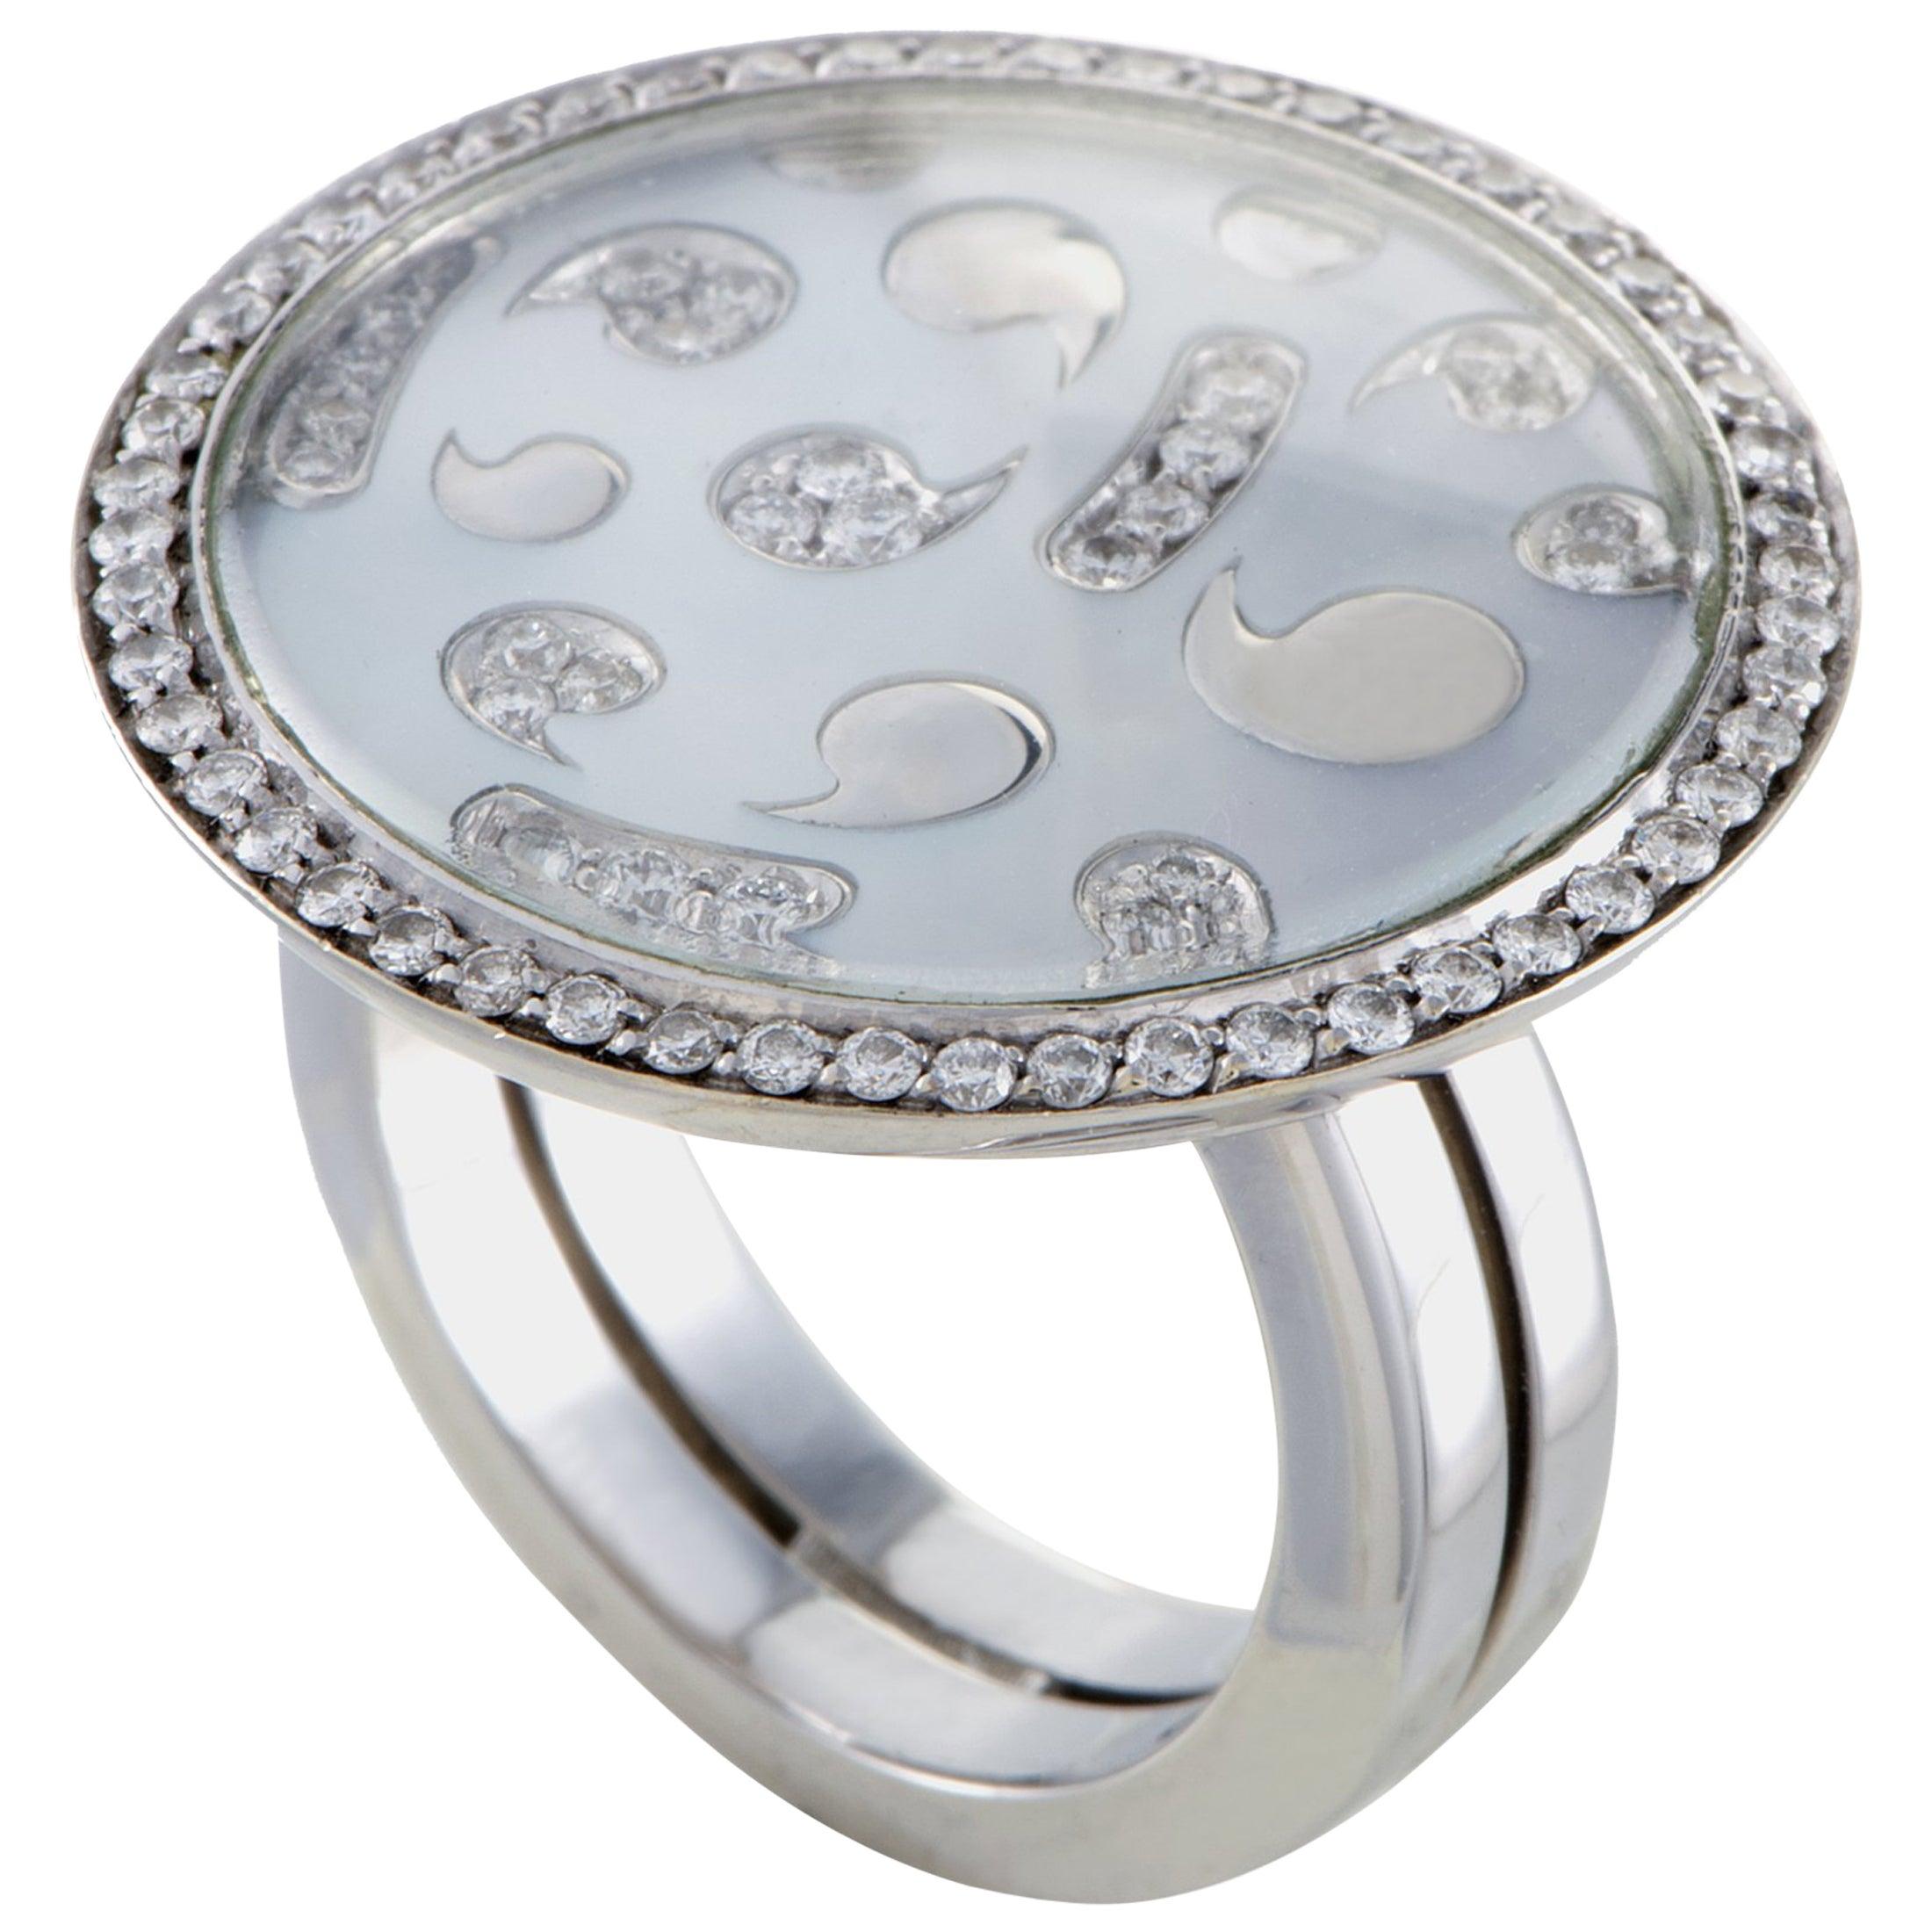 891694c6a0f Korloff Womens 18 Karat White Gold Diamond and Mother-of-Pearl Round Ring  at 1stdibs